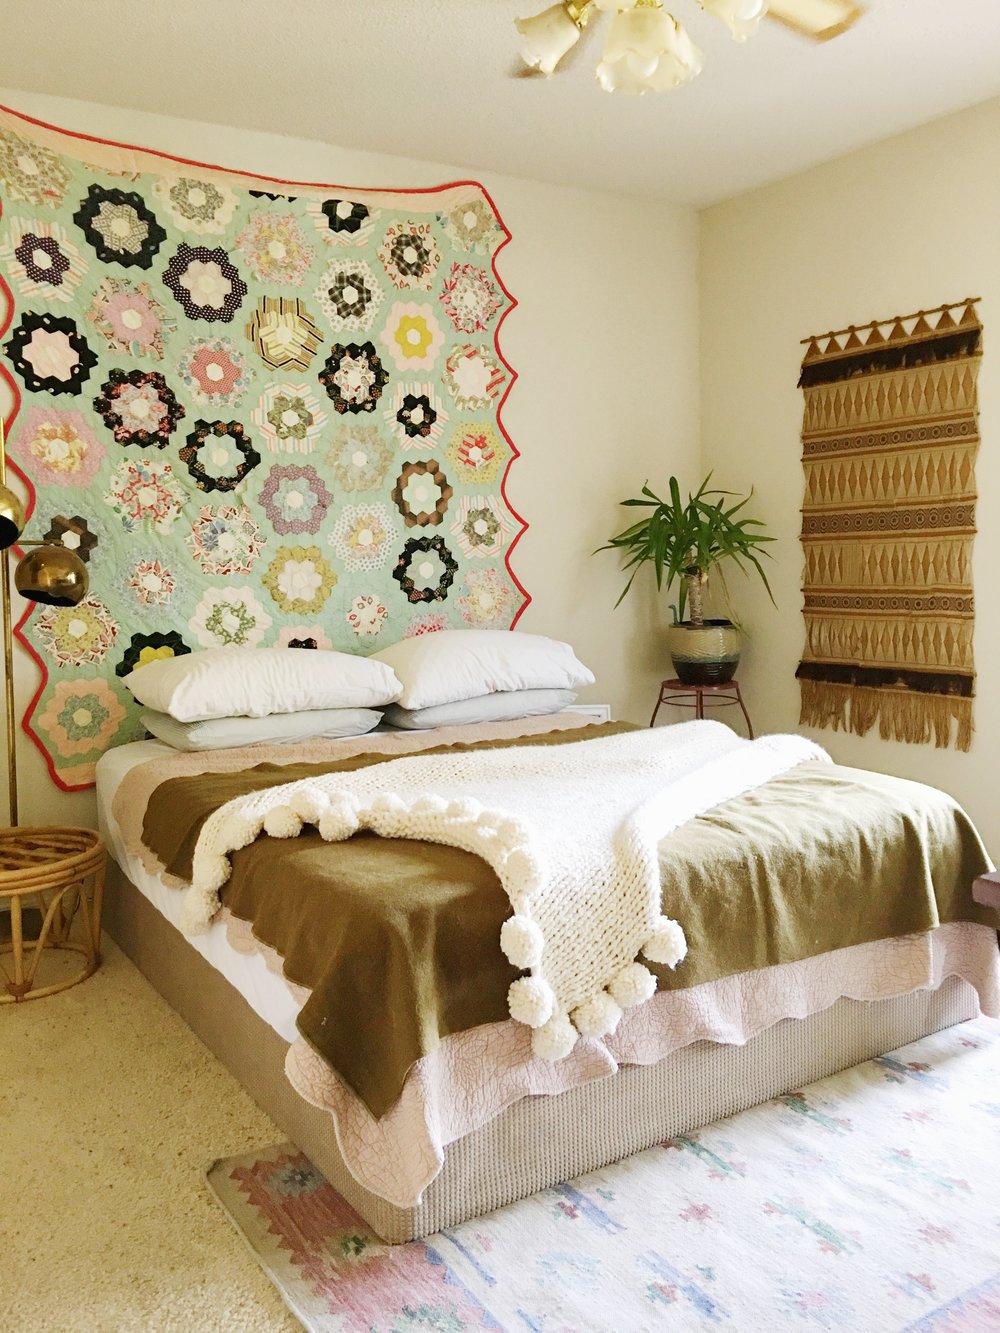 Home Styling Before After A Tulsa 80s Boho Bedroom Retro Den Vintage Furniture And Homewares